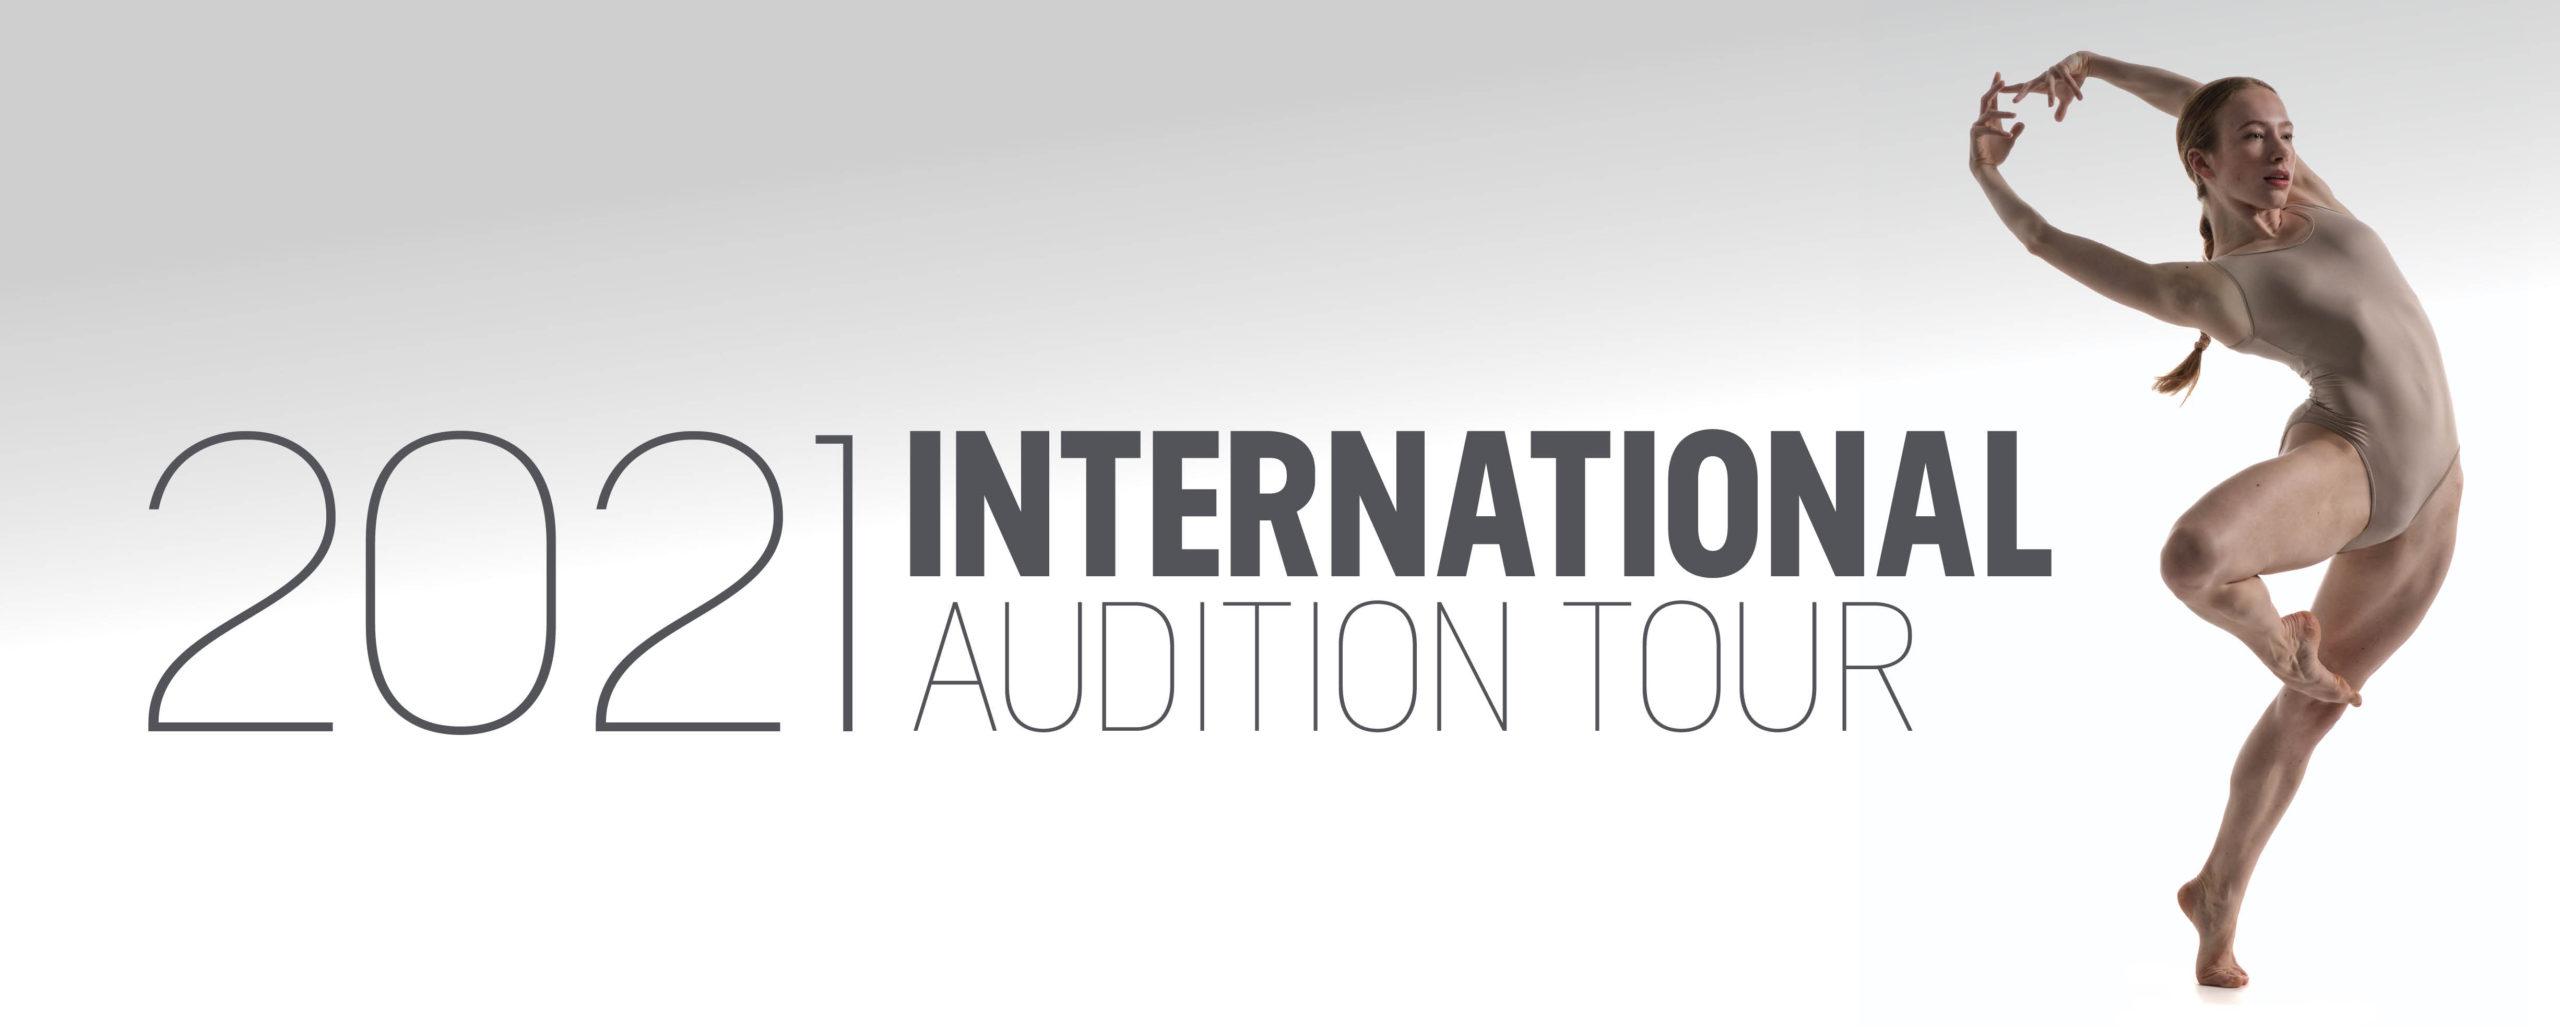 2021 International Audition Tour | Arts Umbrella Dance